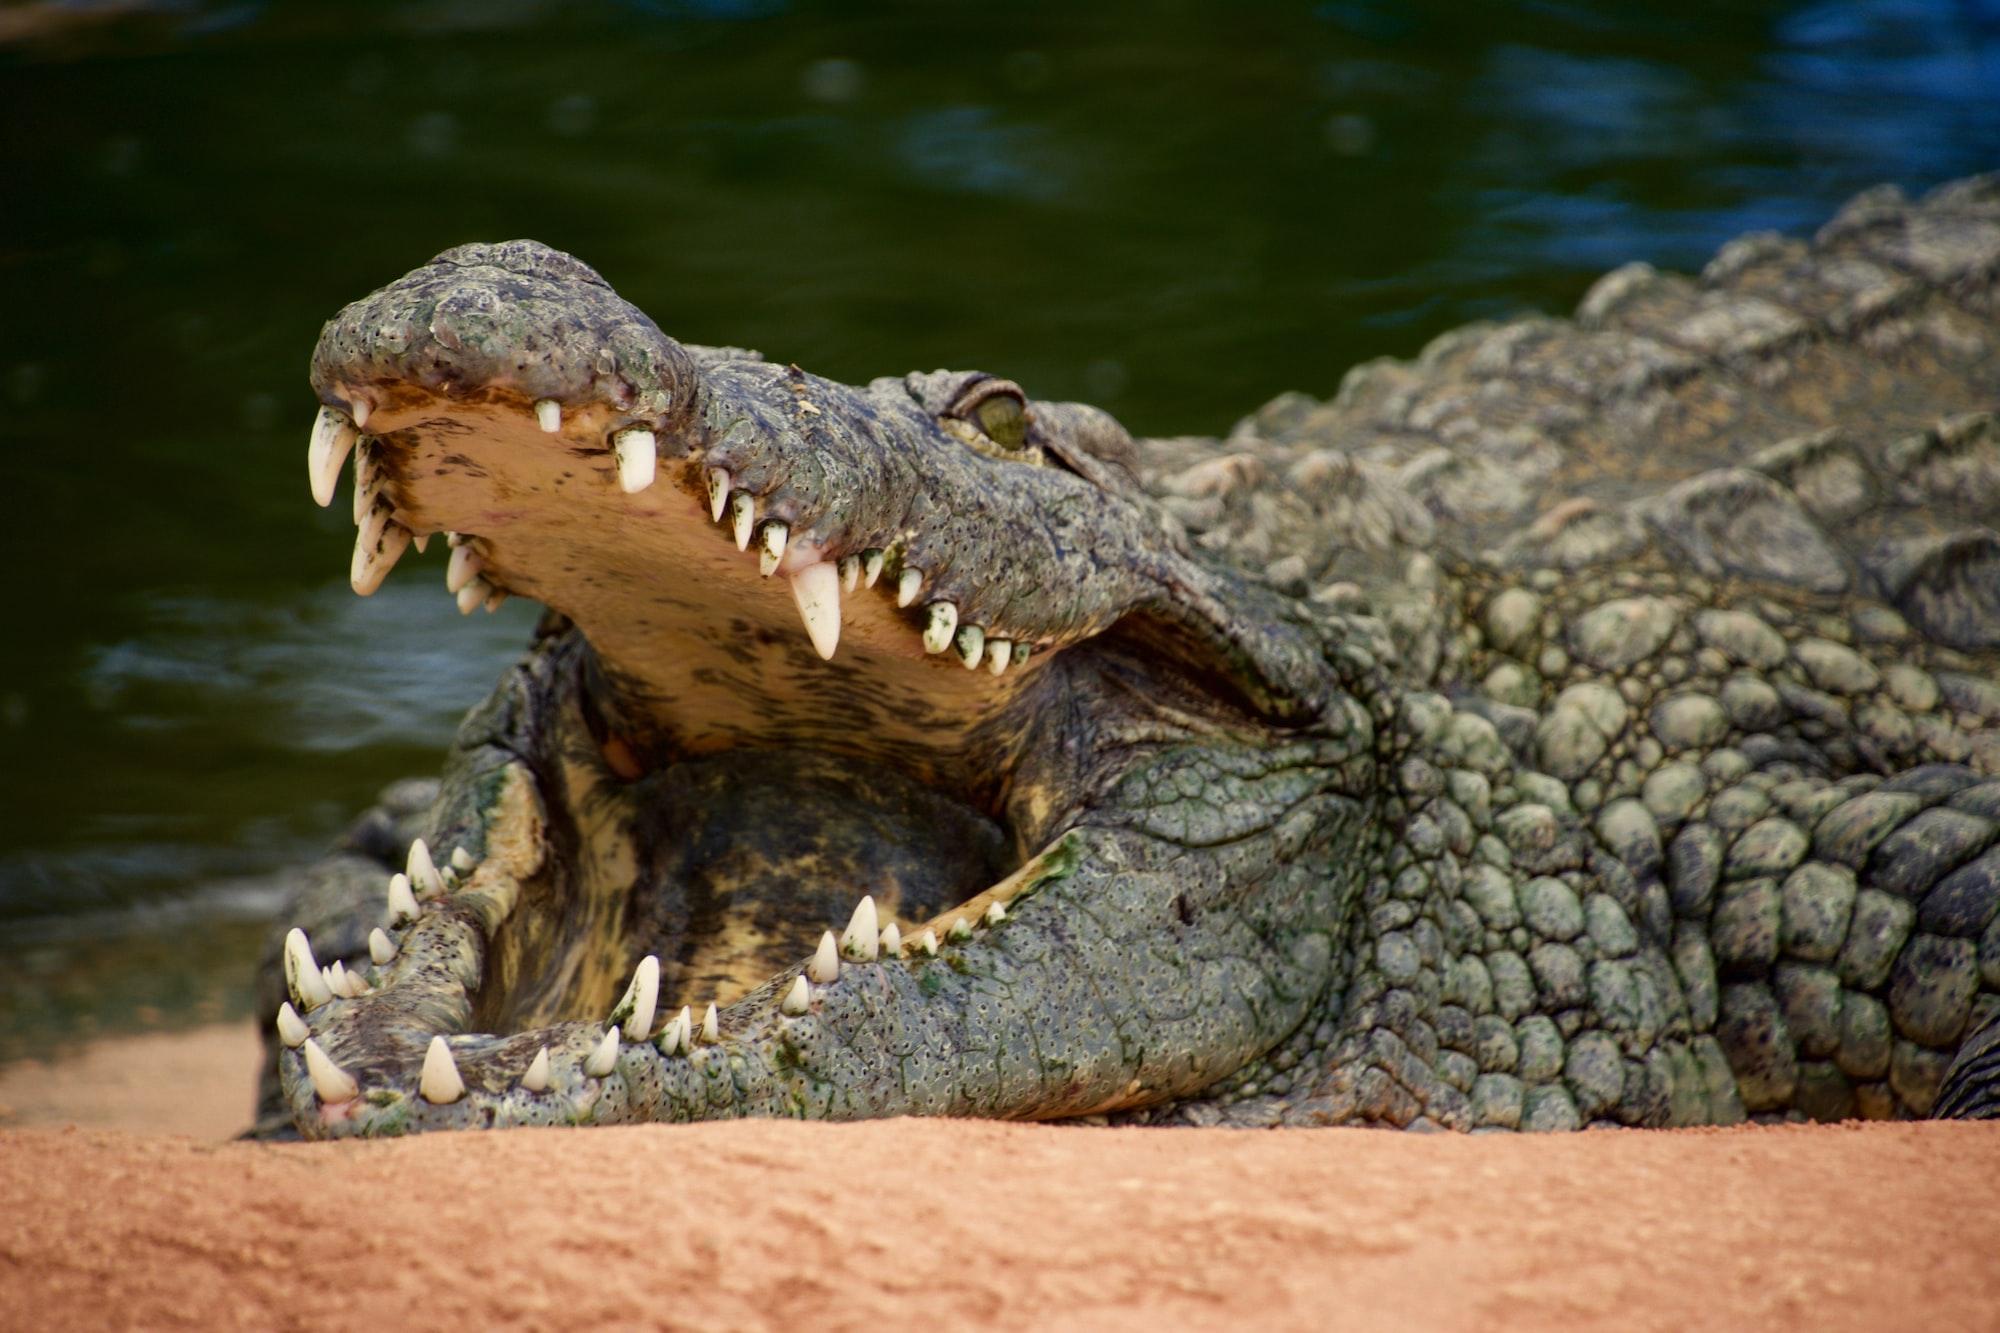 Stop Feeding the Crocodile